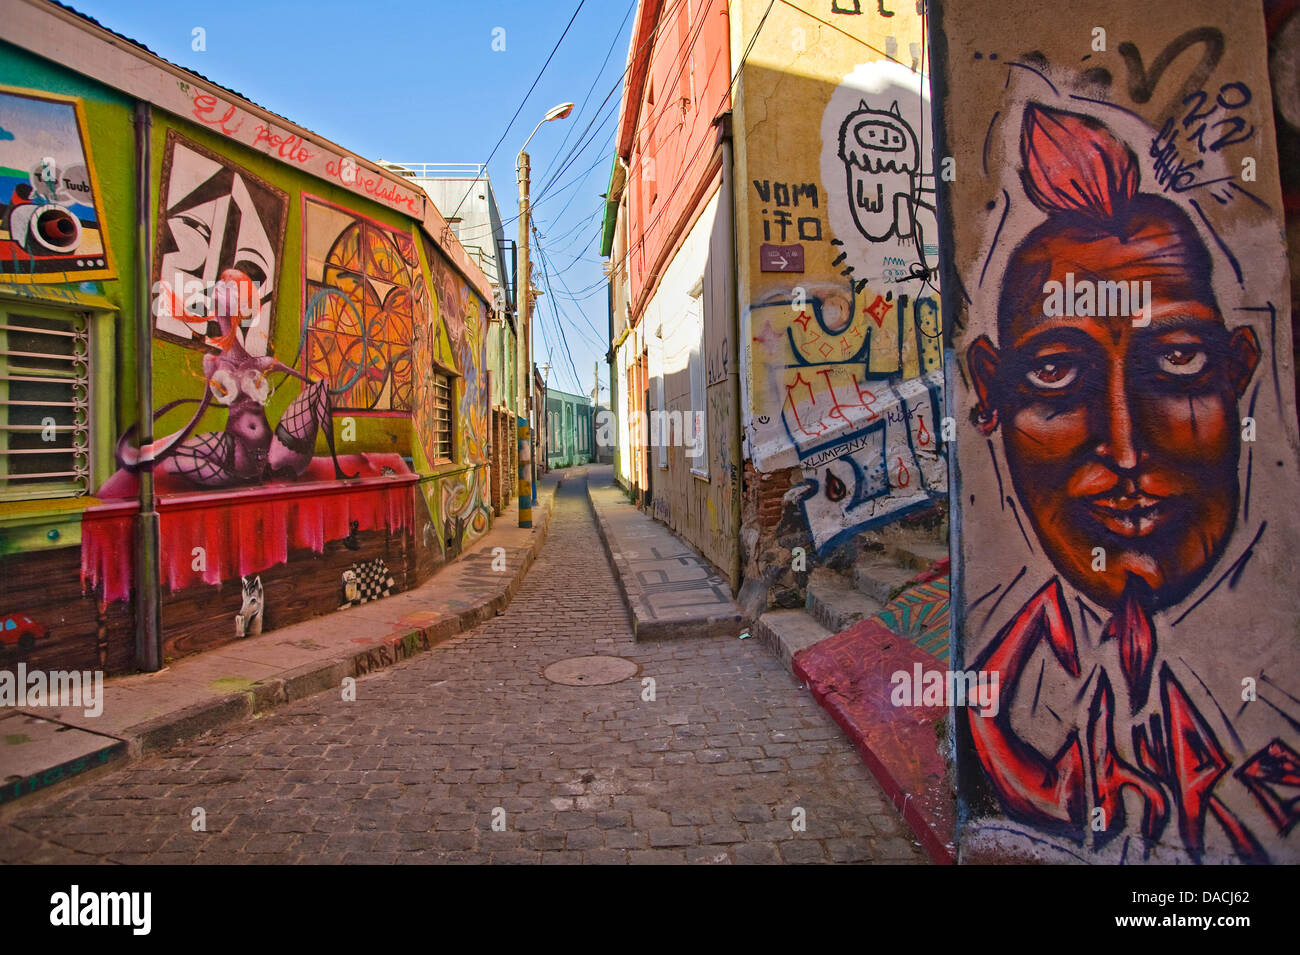 Street scene in Valparaiso, Chile - Stock Image